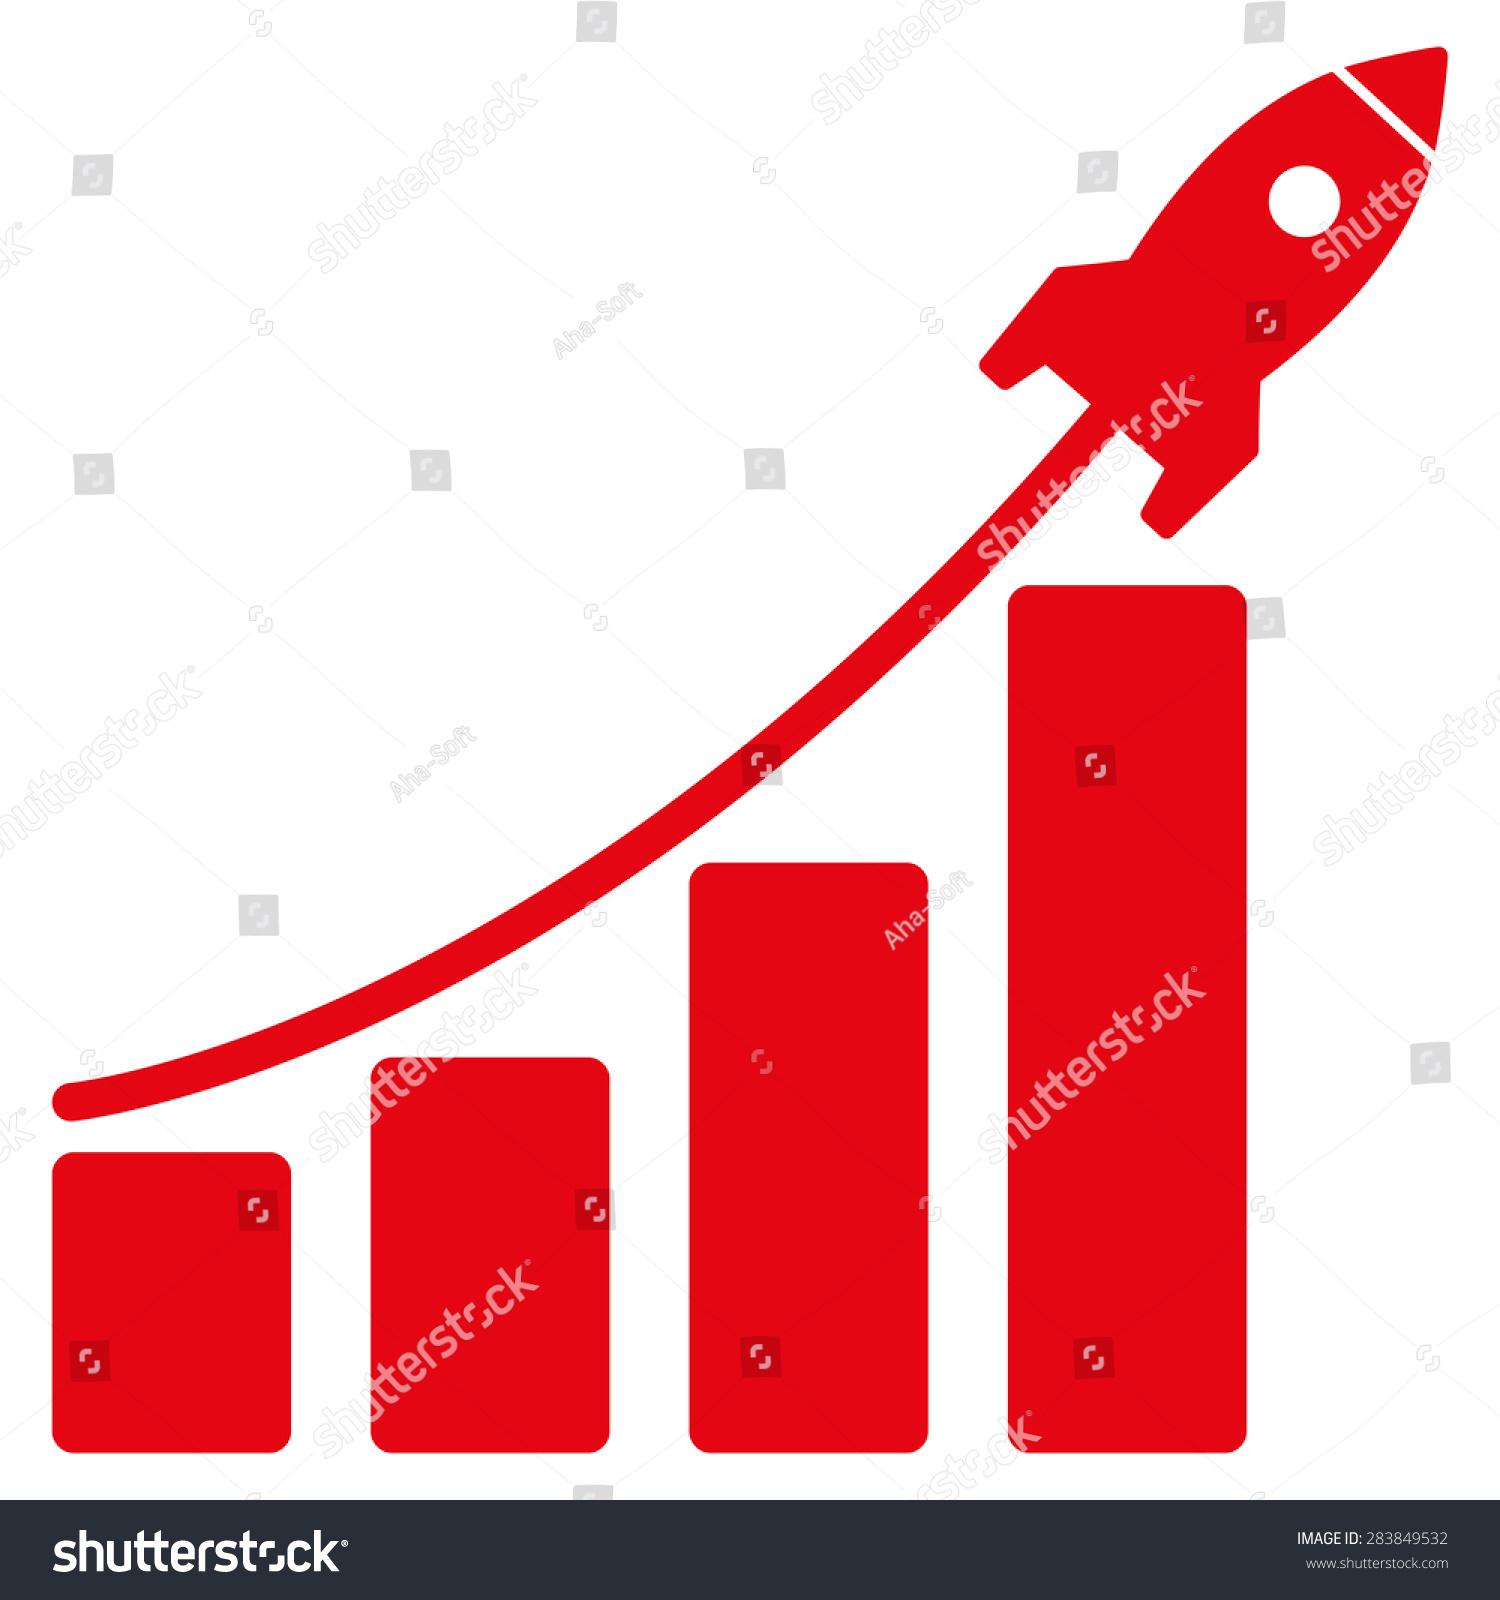 Startup stock options percentage